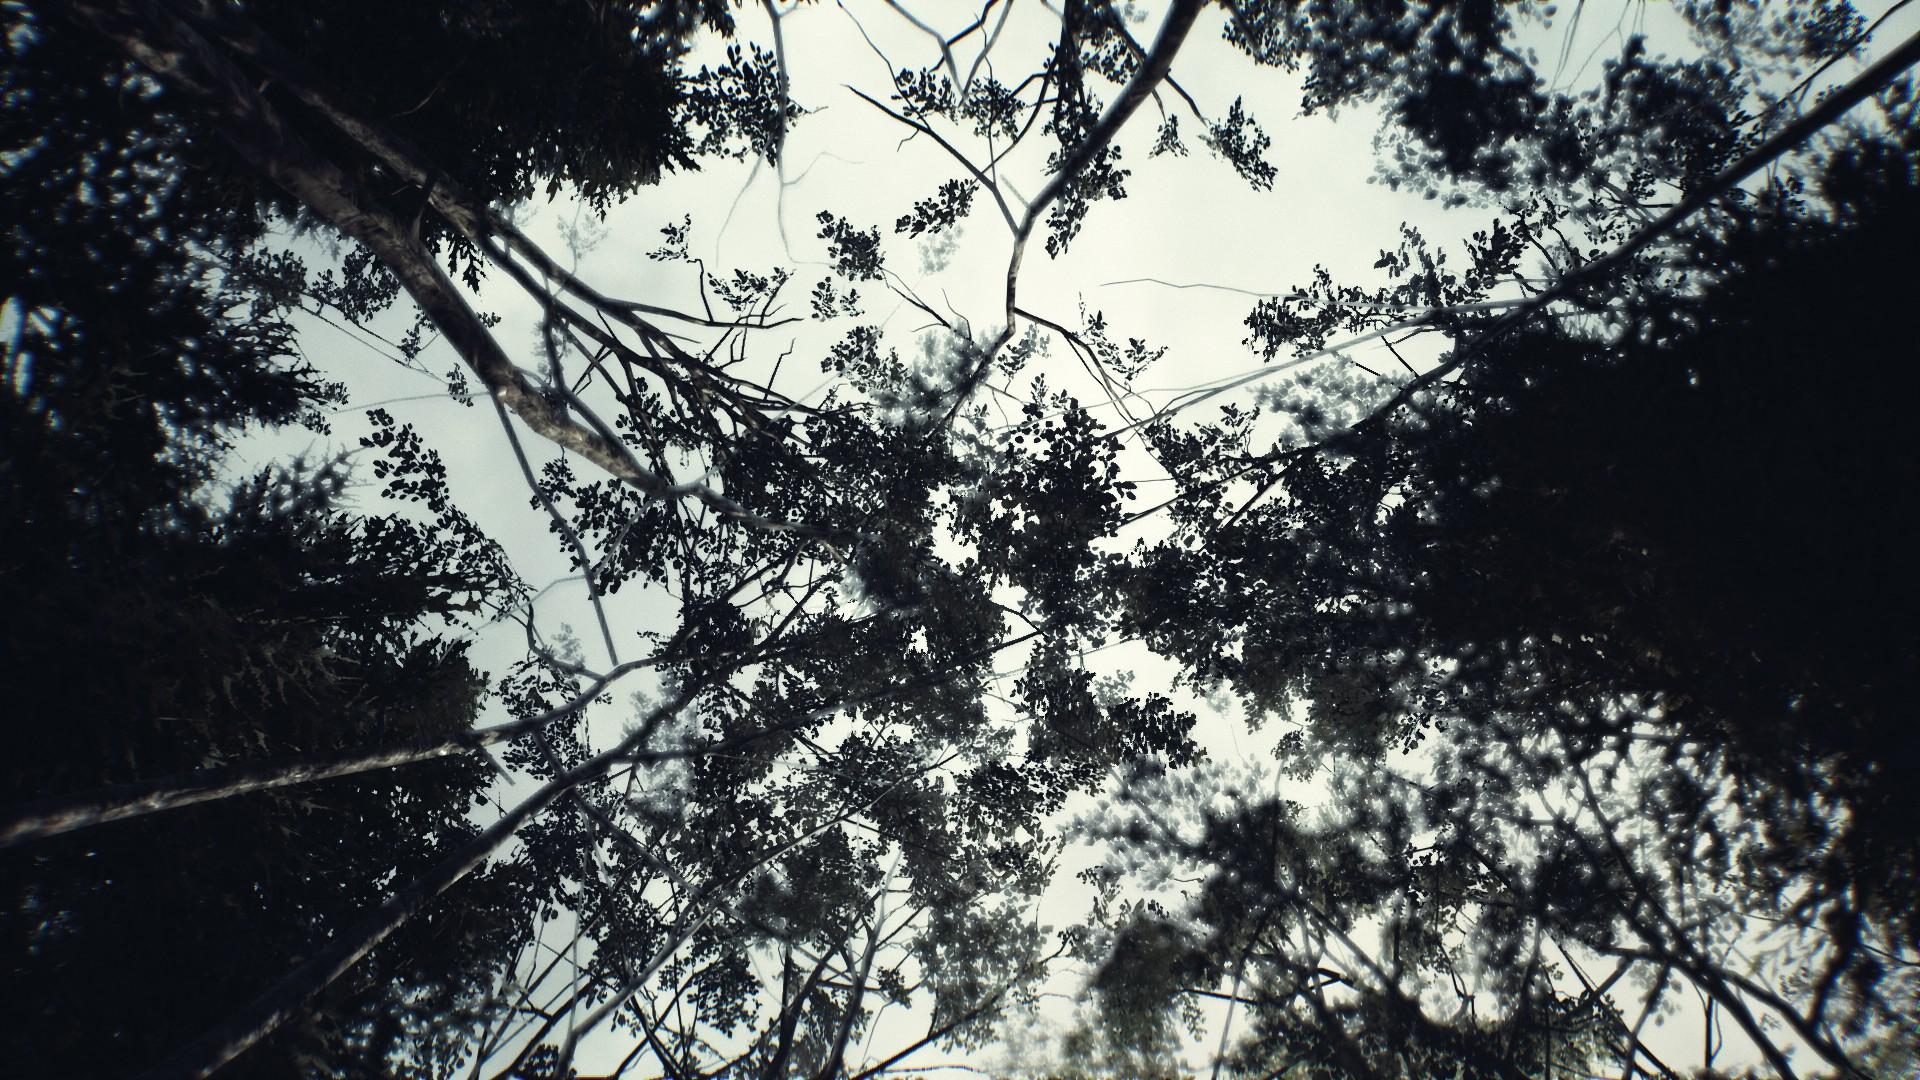 La cime des arbres vu d'en bas.